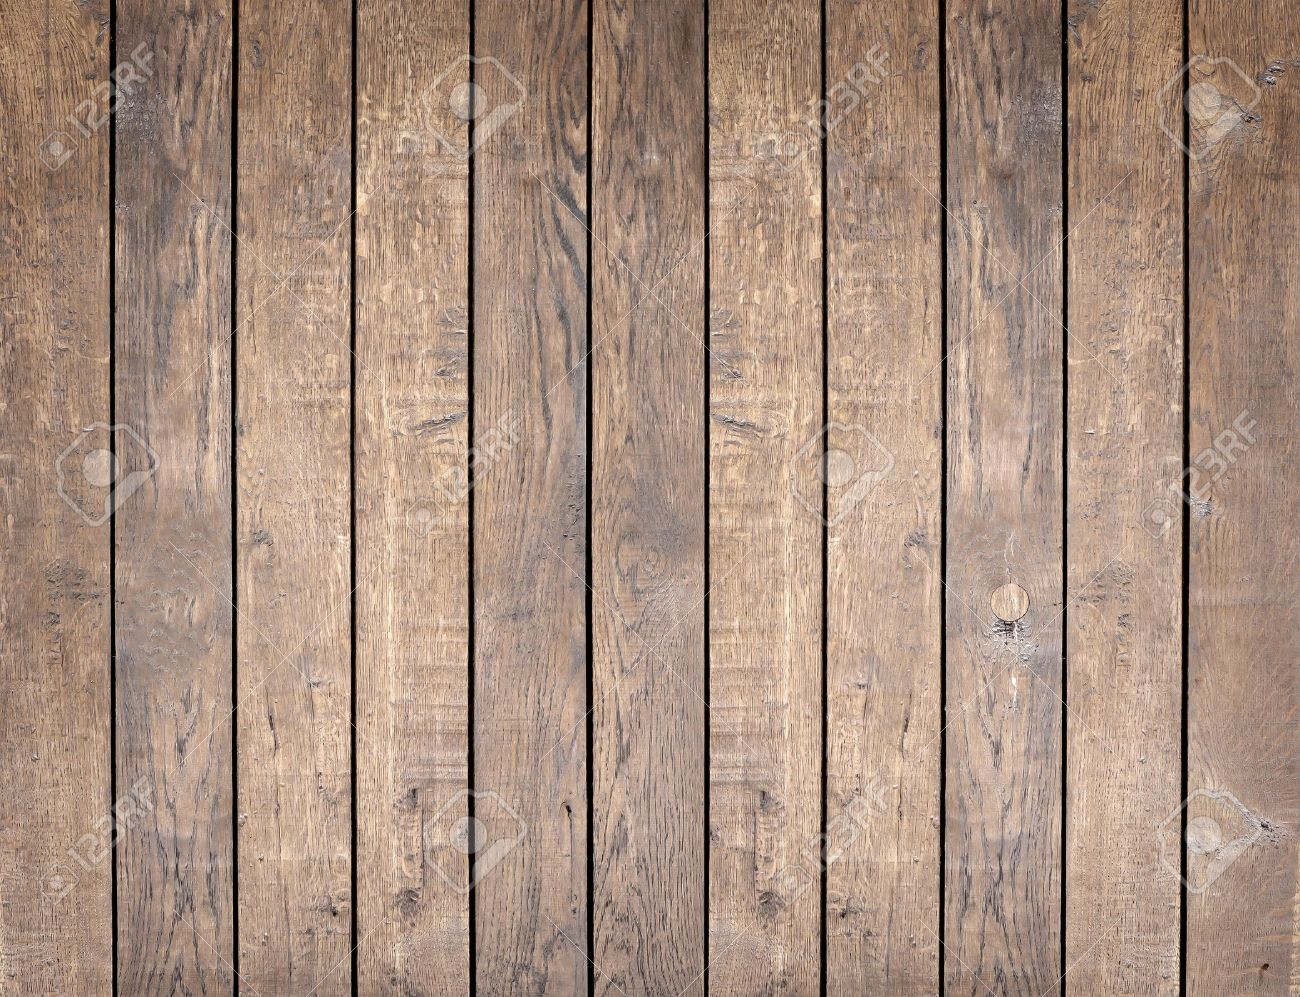 Wall panel hardwood flooring miami by ribadao lumber amp flooring - Walnut Floor Wood Texture Background Old Panels Walnut Floor Stock Photos Images Royalty Free Walnut